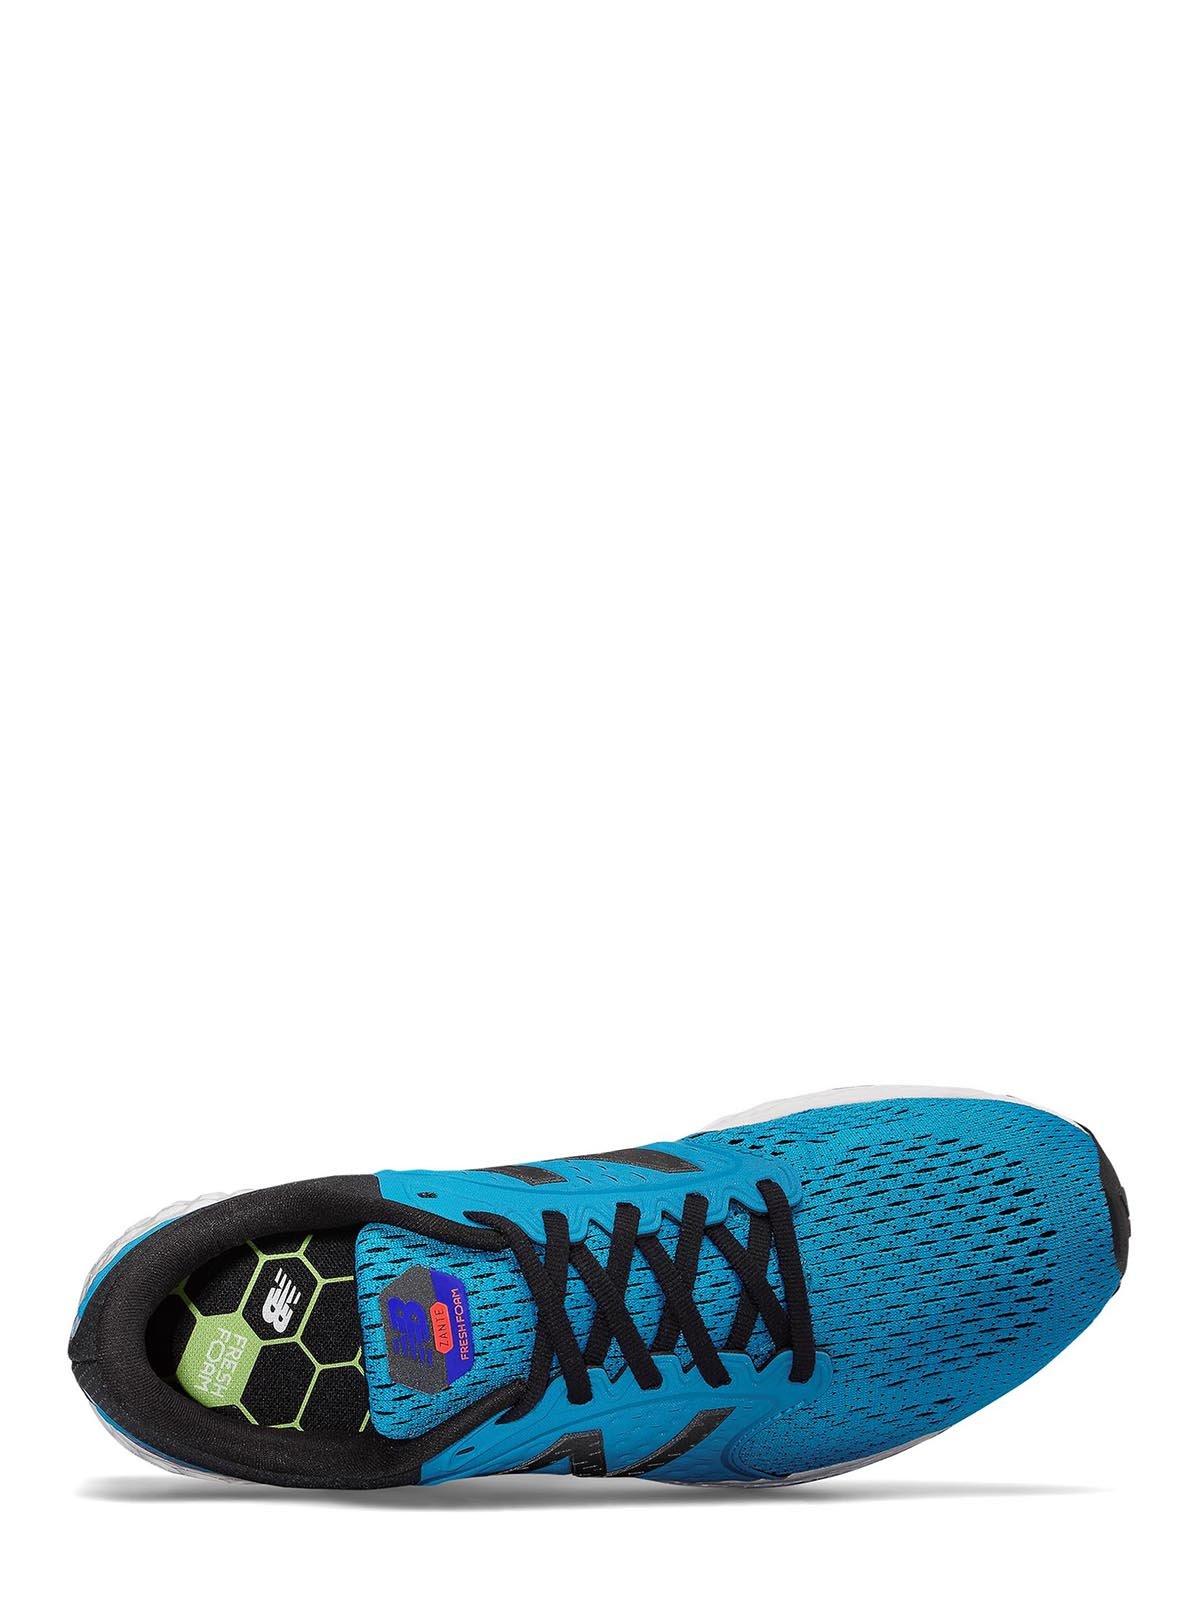 Кросівки блакитні Fresh Foam Zante v4 | 4042483 | фото 3